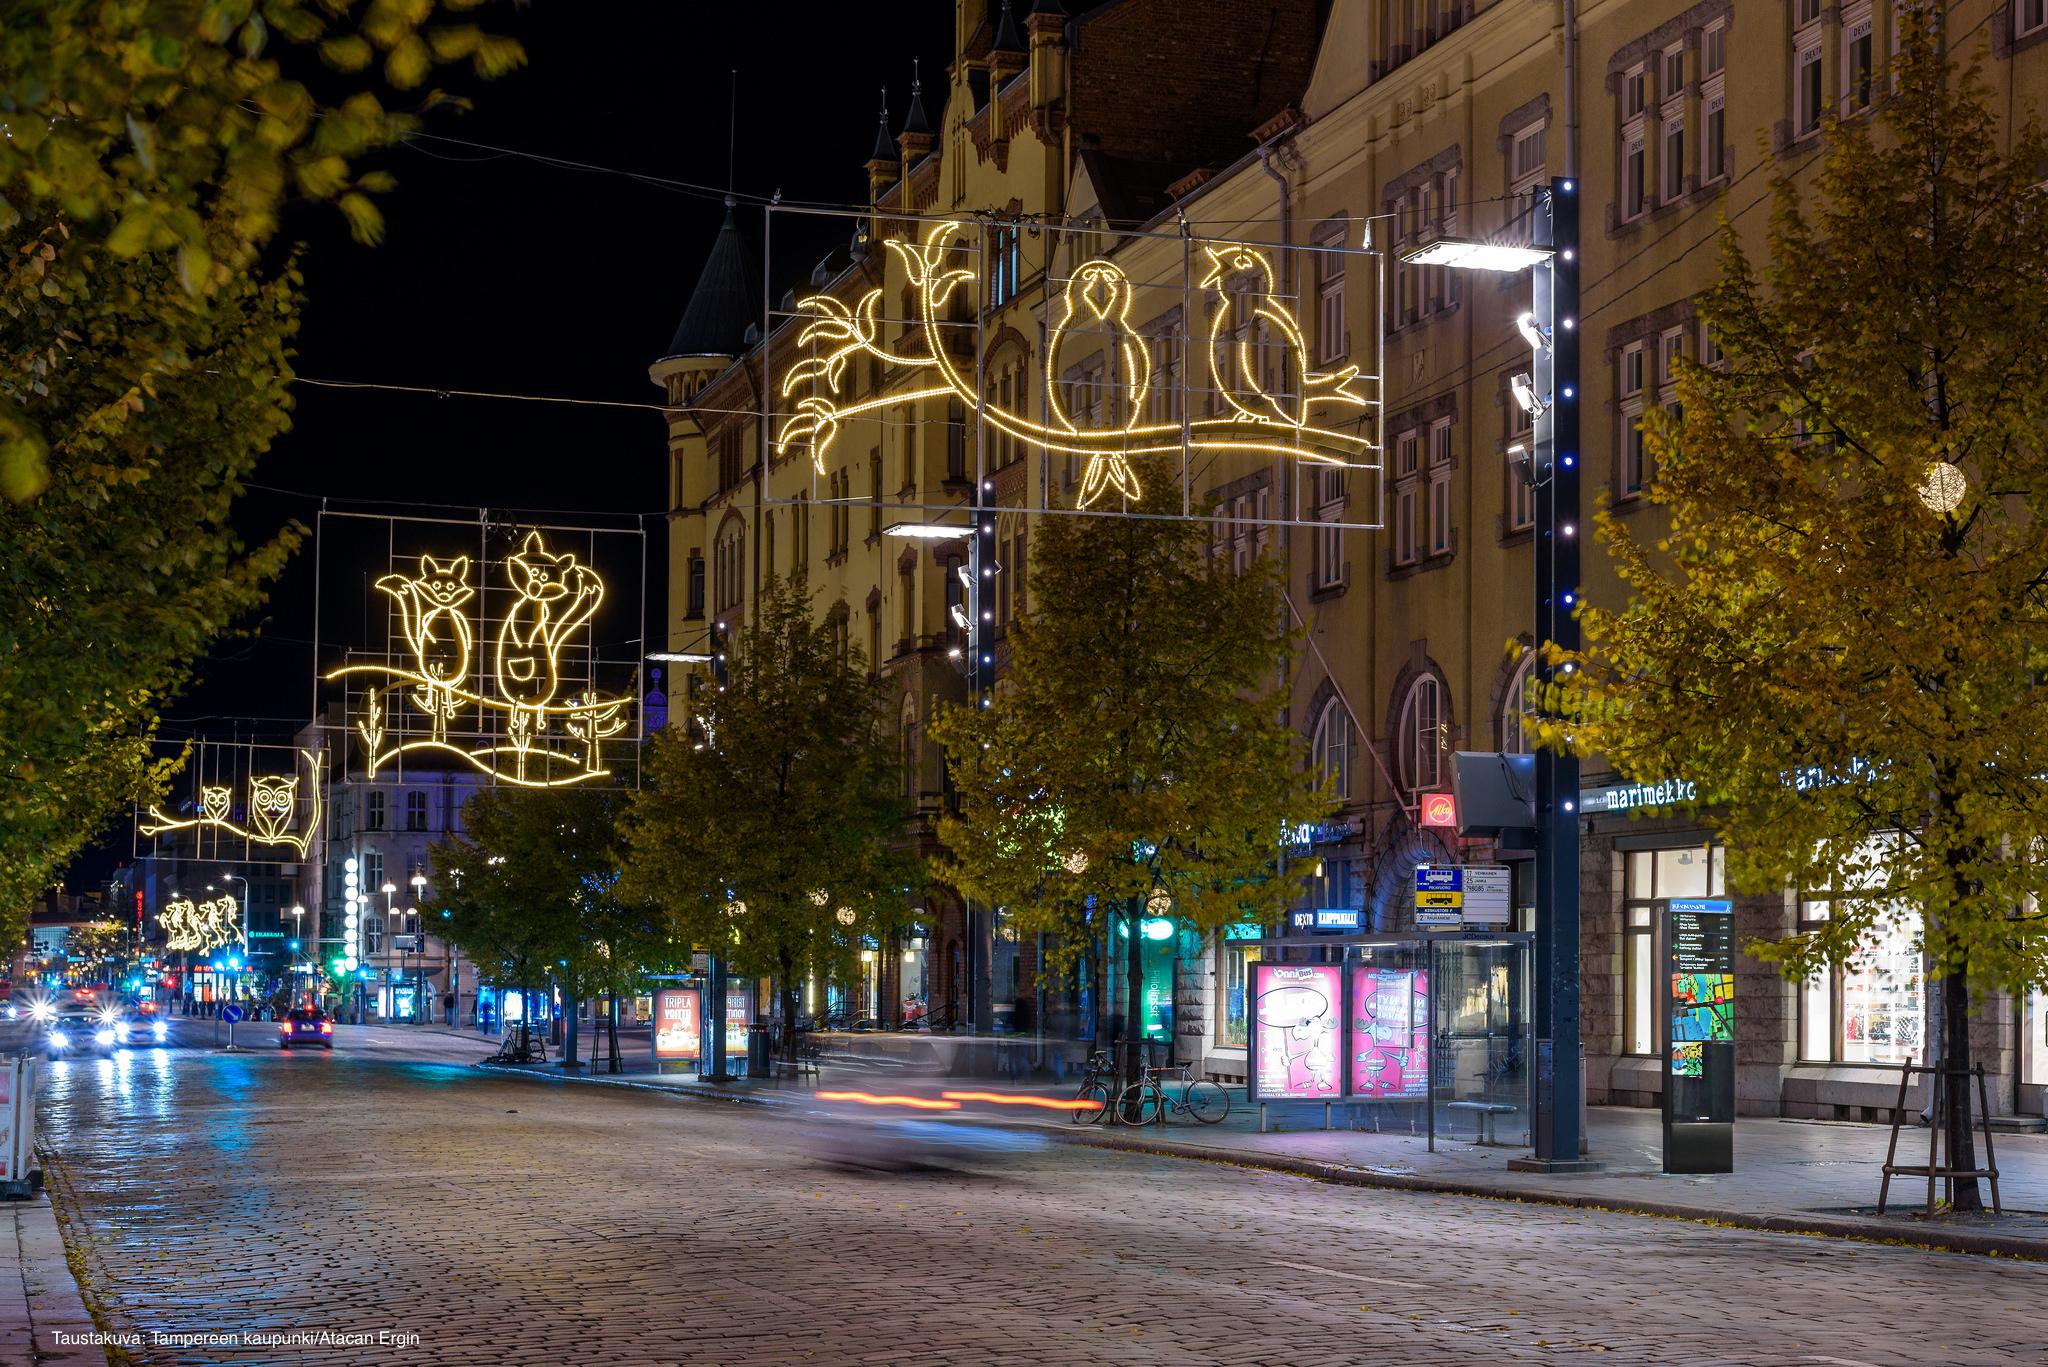 Final Thesis. Concept design of signage product family for the city of Tampere. 2016. Simo Lahtinen. Industrial Design. Photo: Simo Lahtinen. Opastelaitteiden tuoteperheen konseptisuunnittelu Tampereen kaupungille.